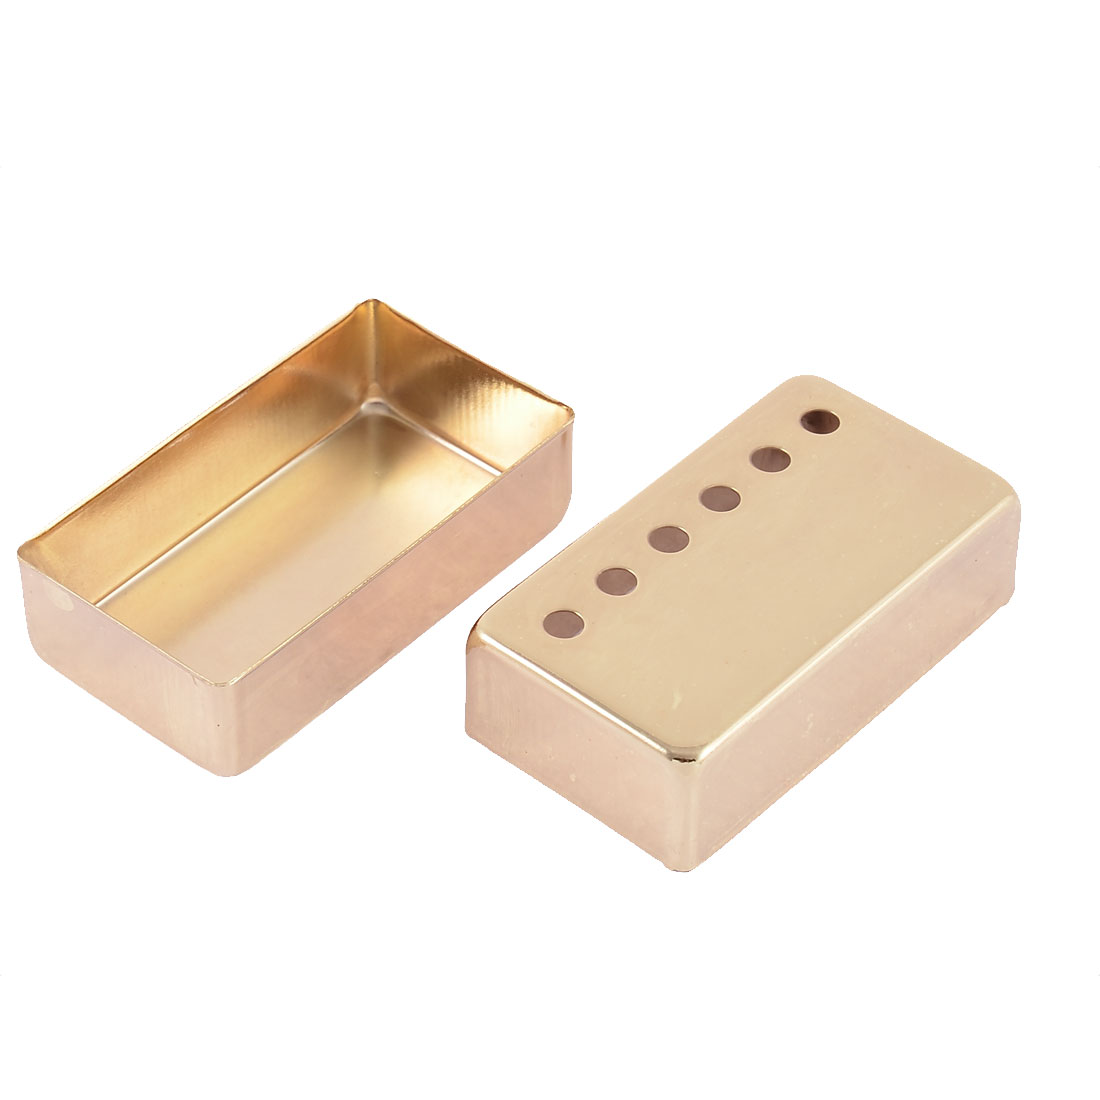 Electric Guitar Humbucker Pickup 7cm x 4cm x 2cm Metal Cover Gold Tone 2pcs